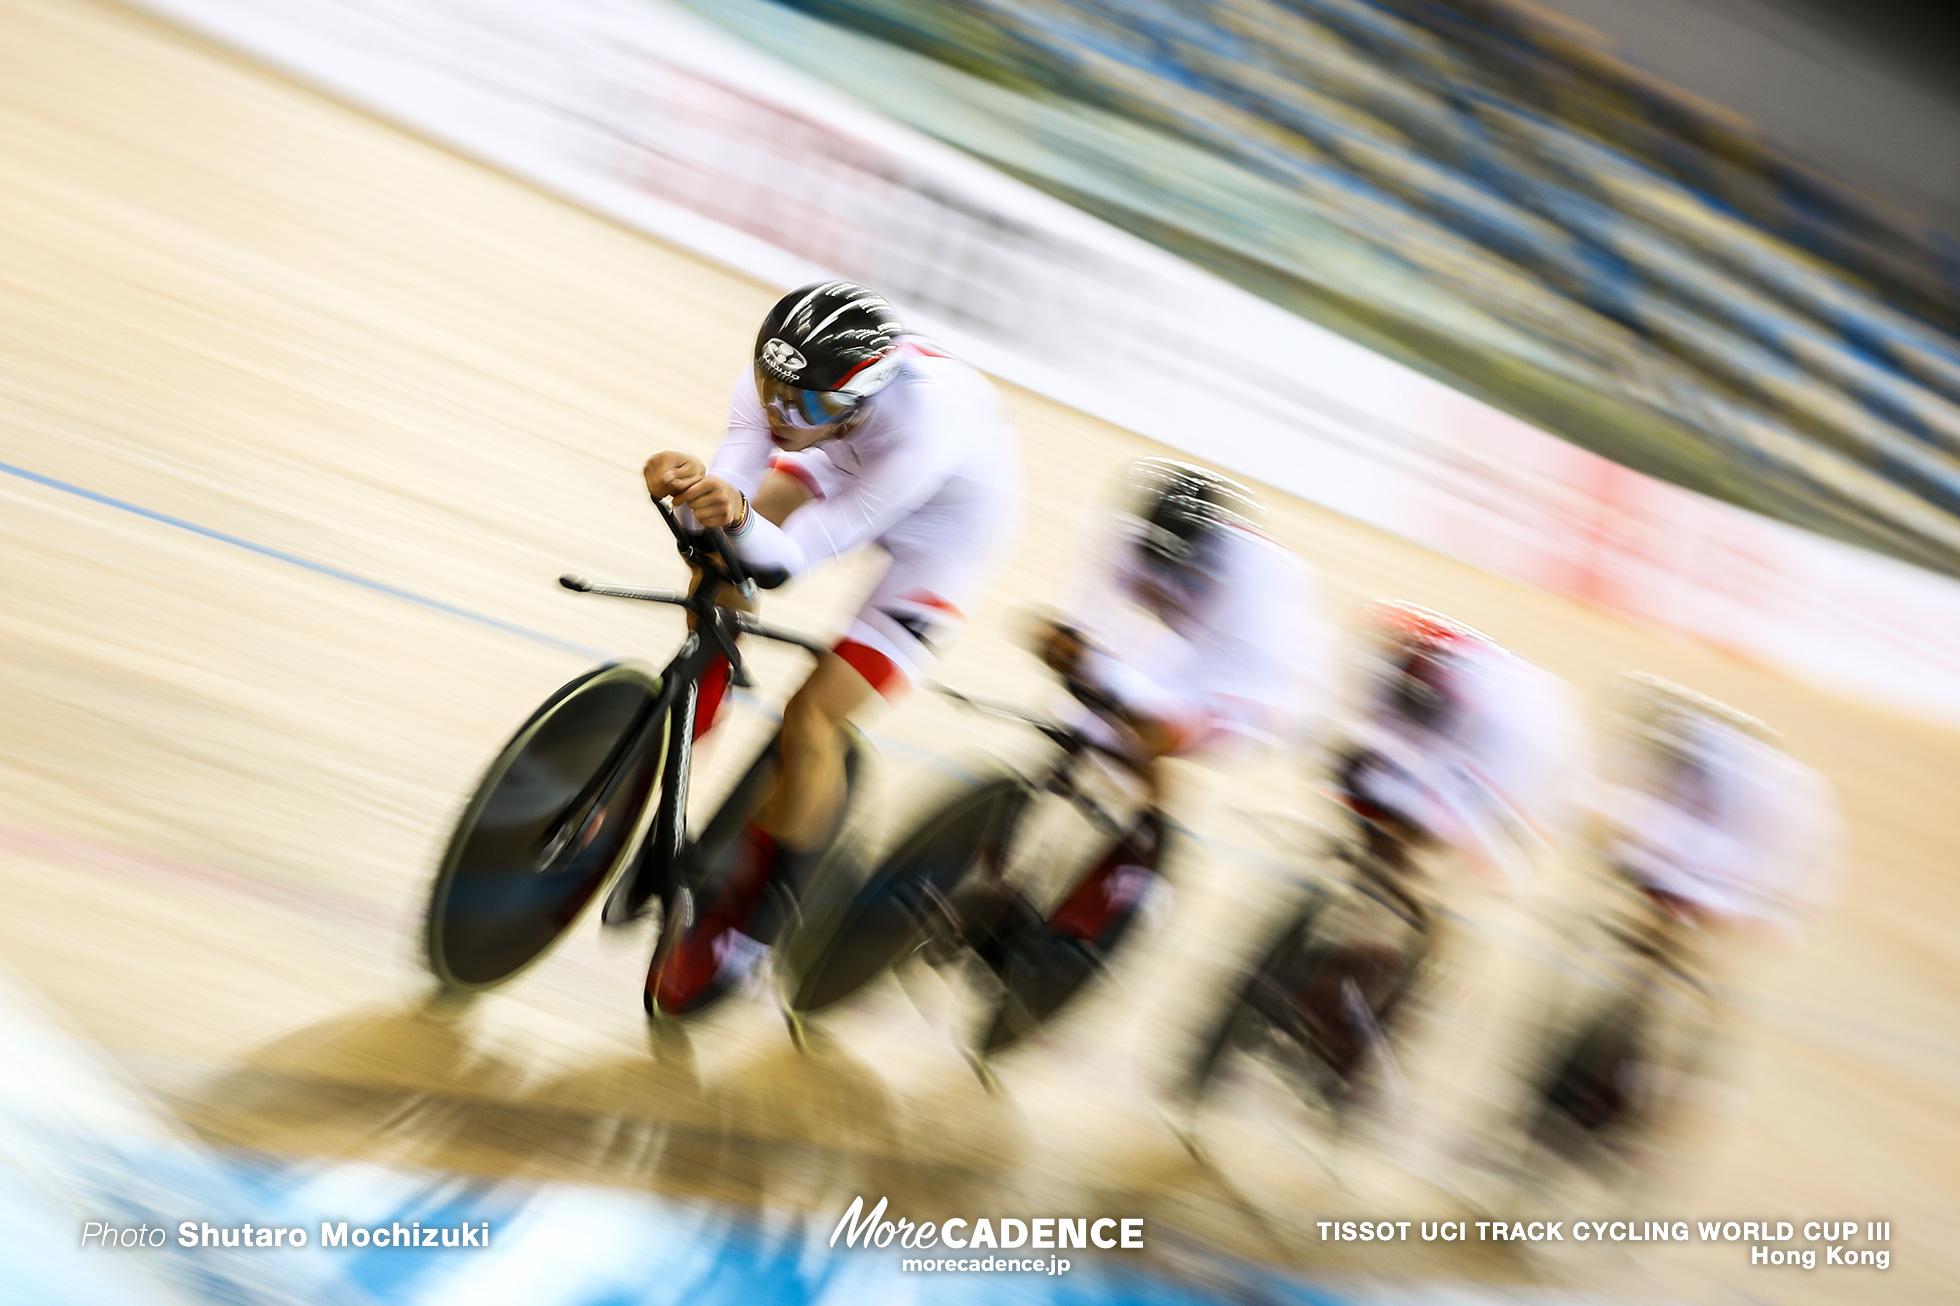 Men's Team Pursuit / TISSOT UCI TRACK CYCLING WORLD CUP III, Hong Kong, 沢田桂太郎 窪木一茂 今村駿介 近谷涼